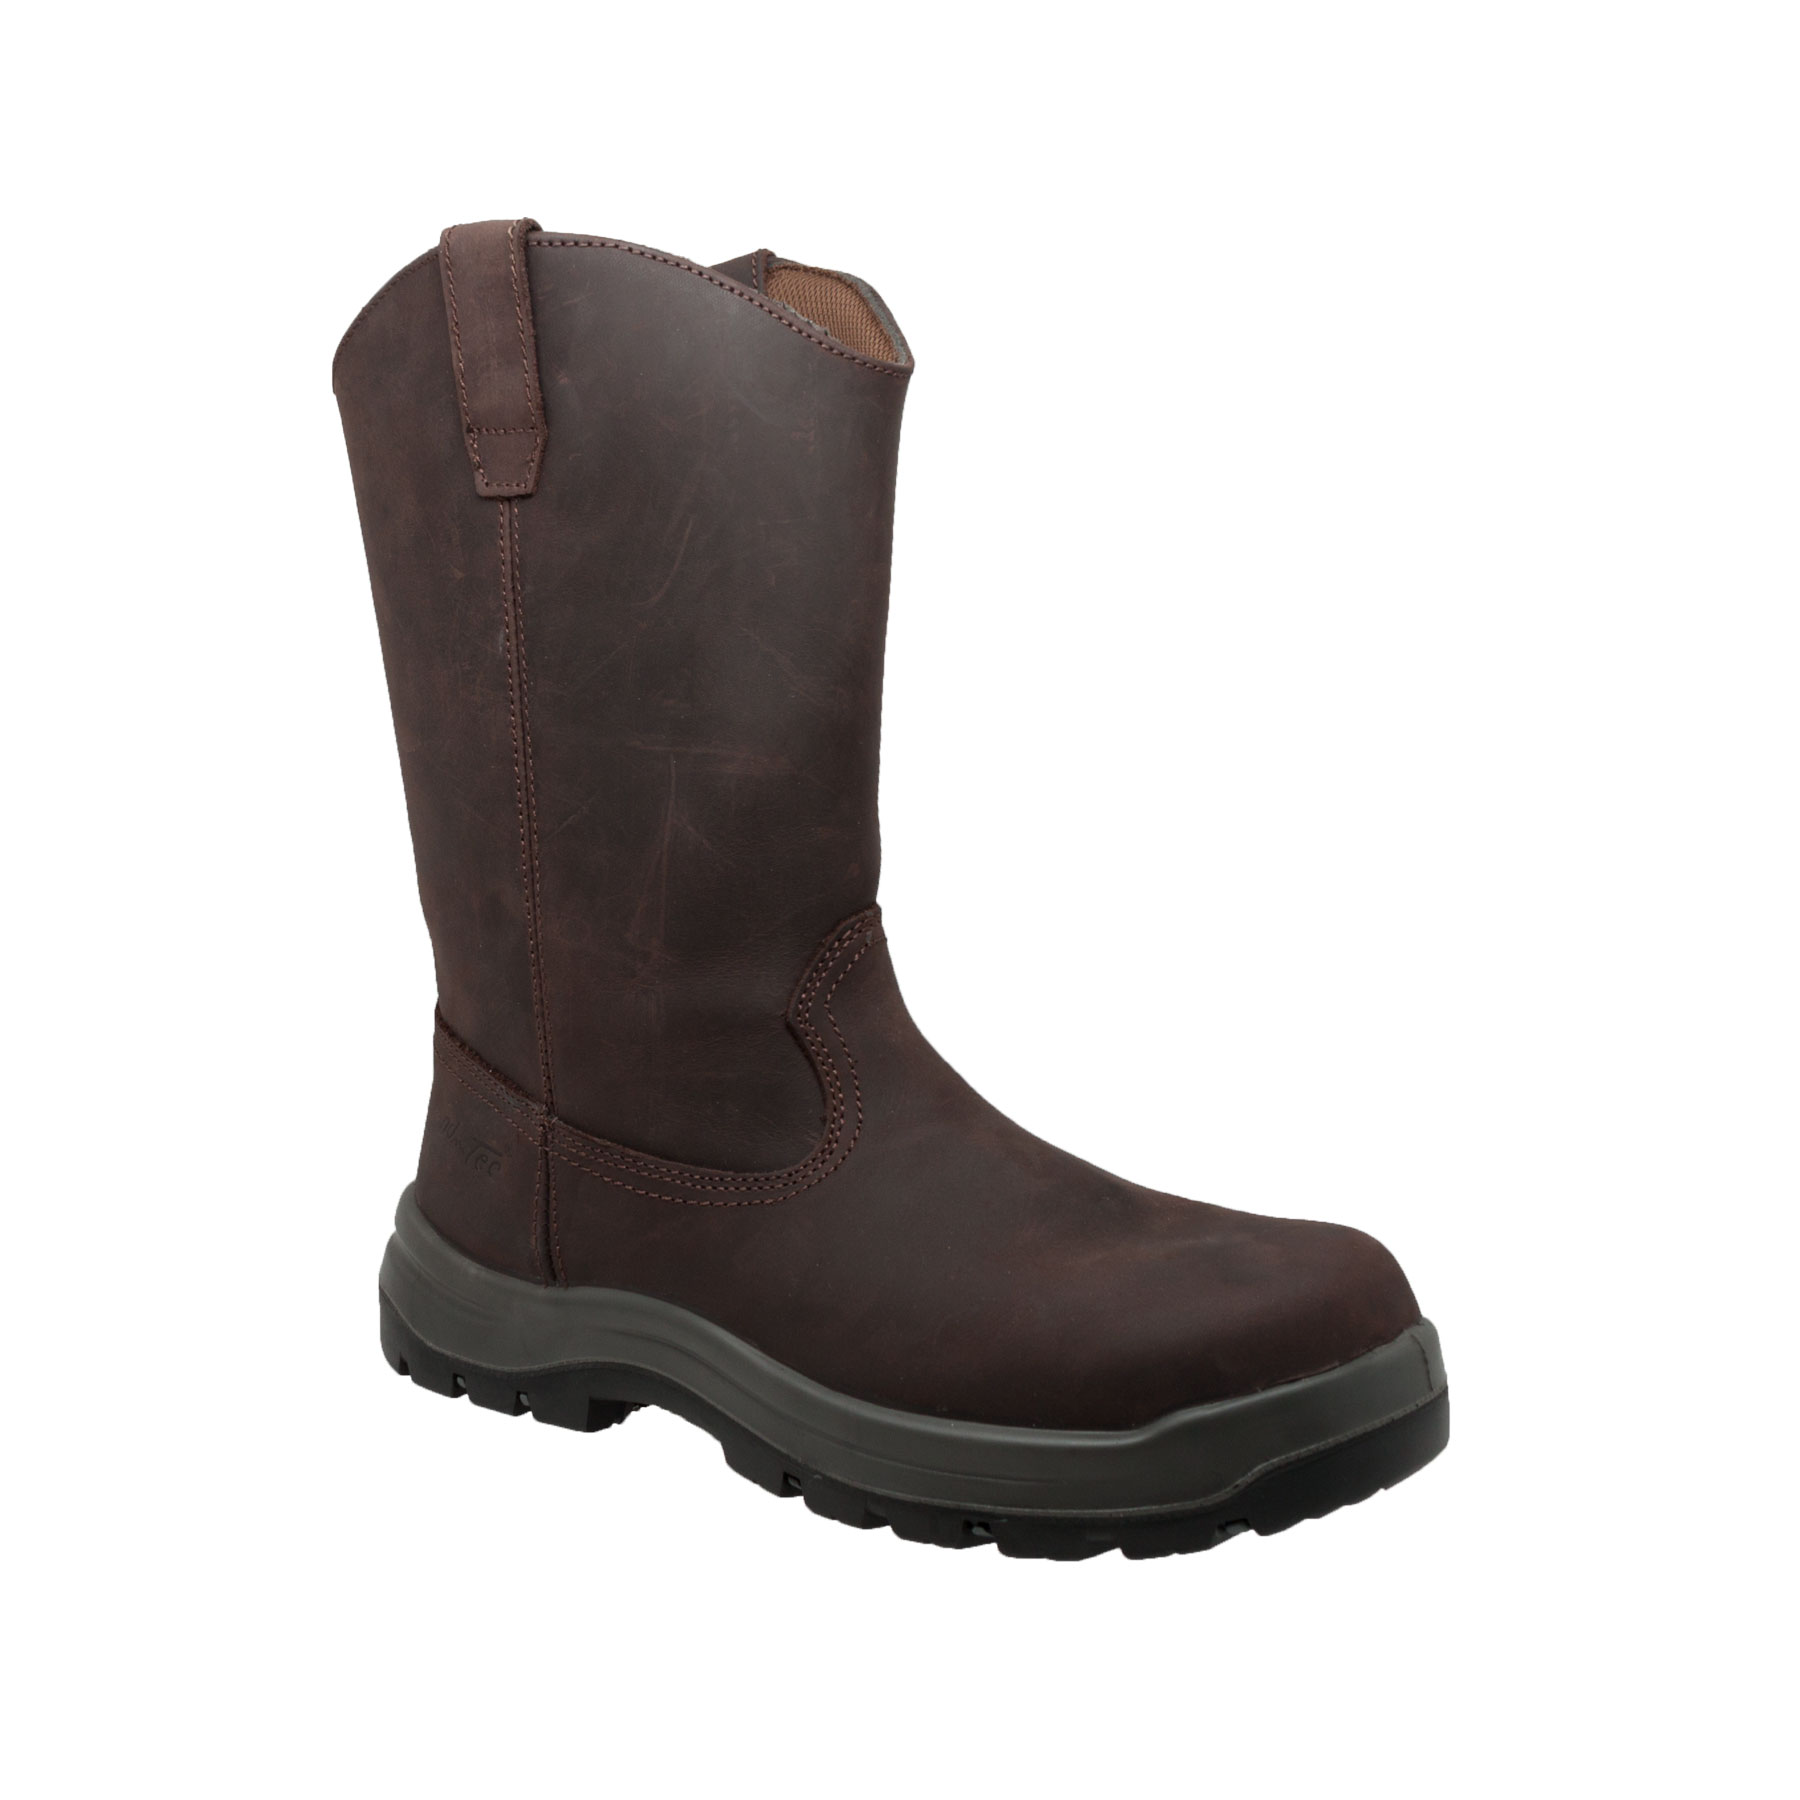 "Adtec Men's 12"" Leather Waterproof Wellington, Dark Brown..."